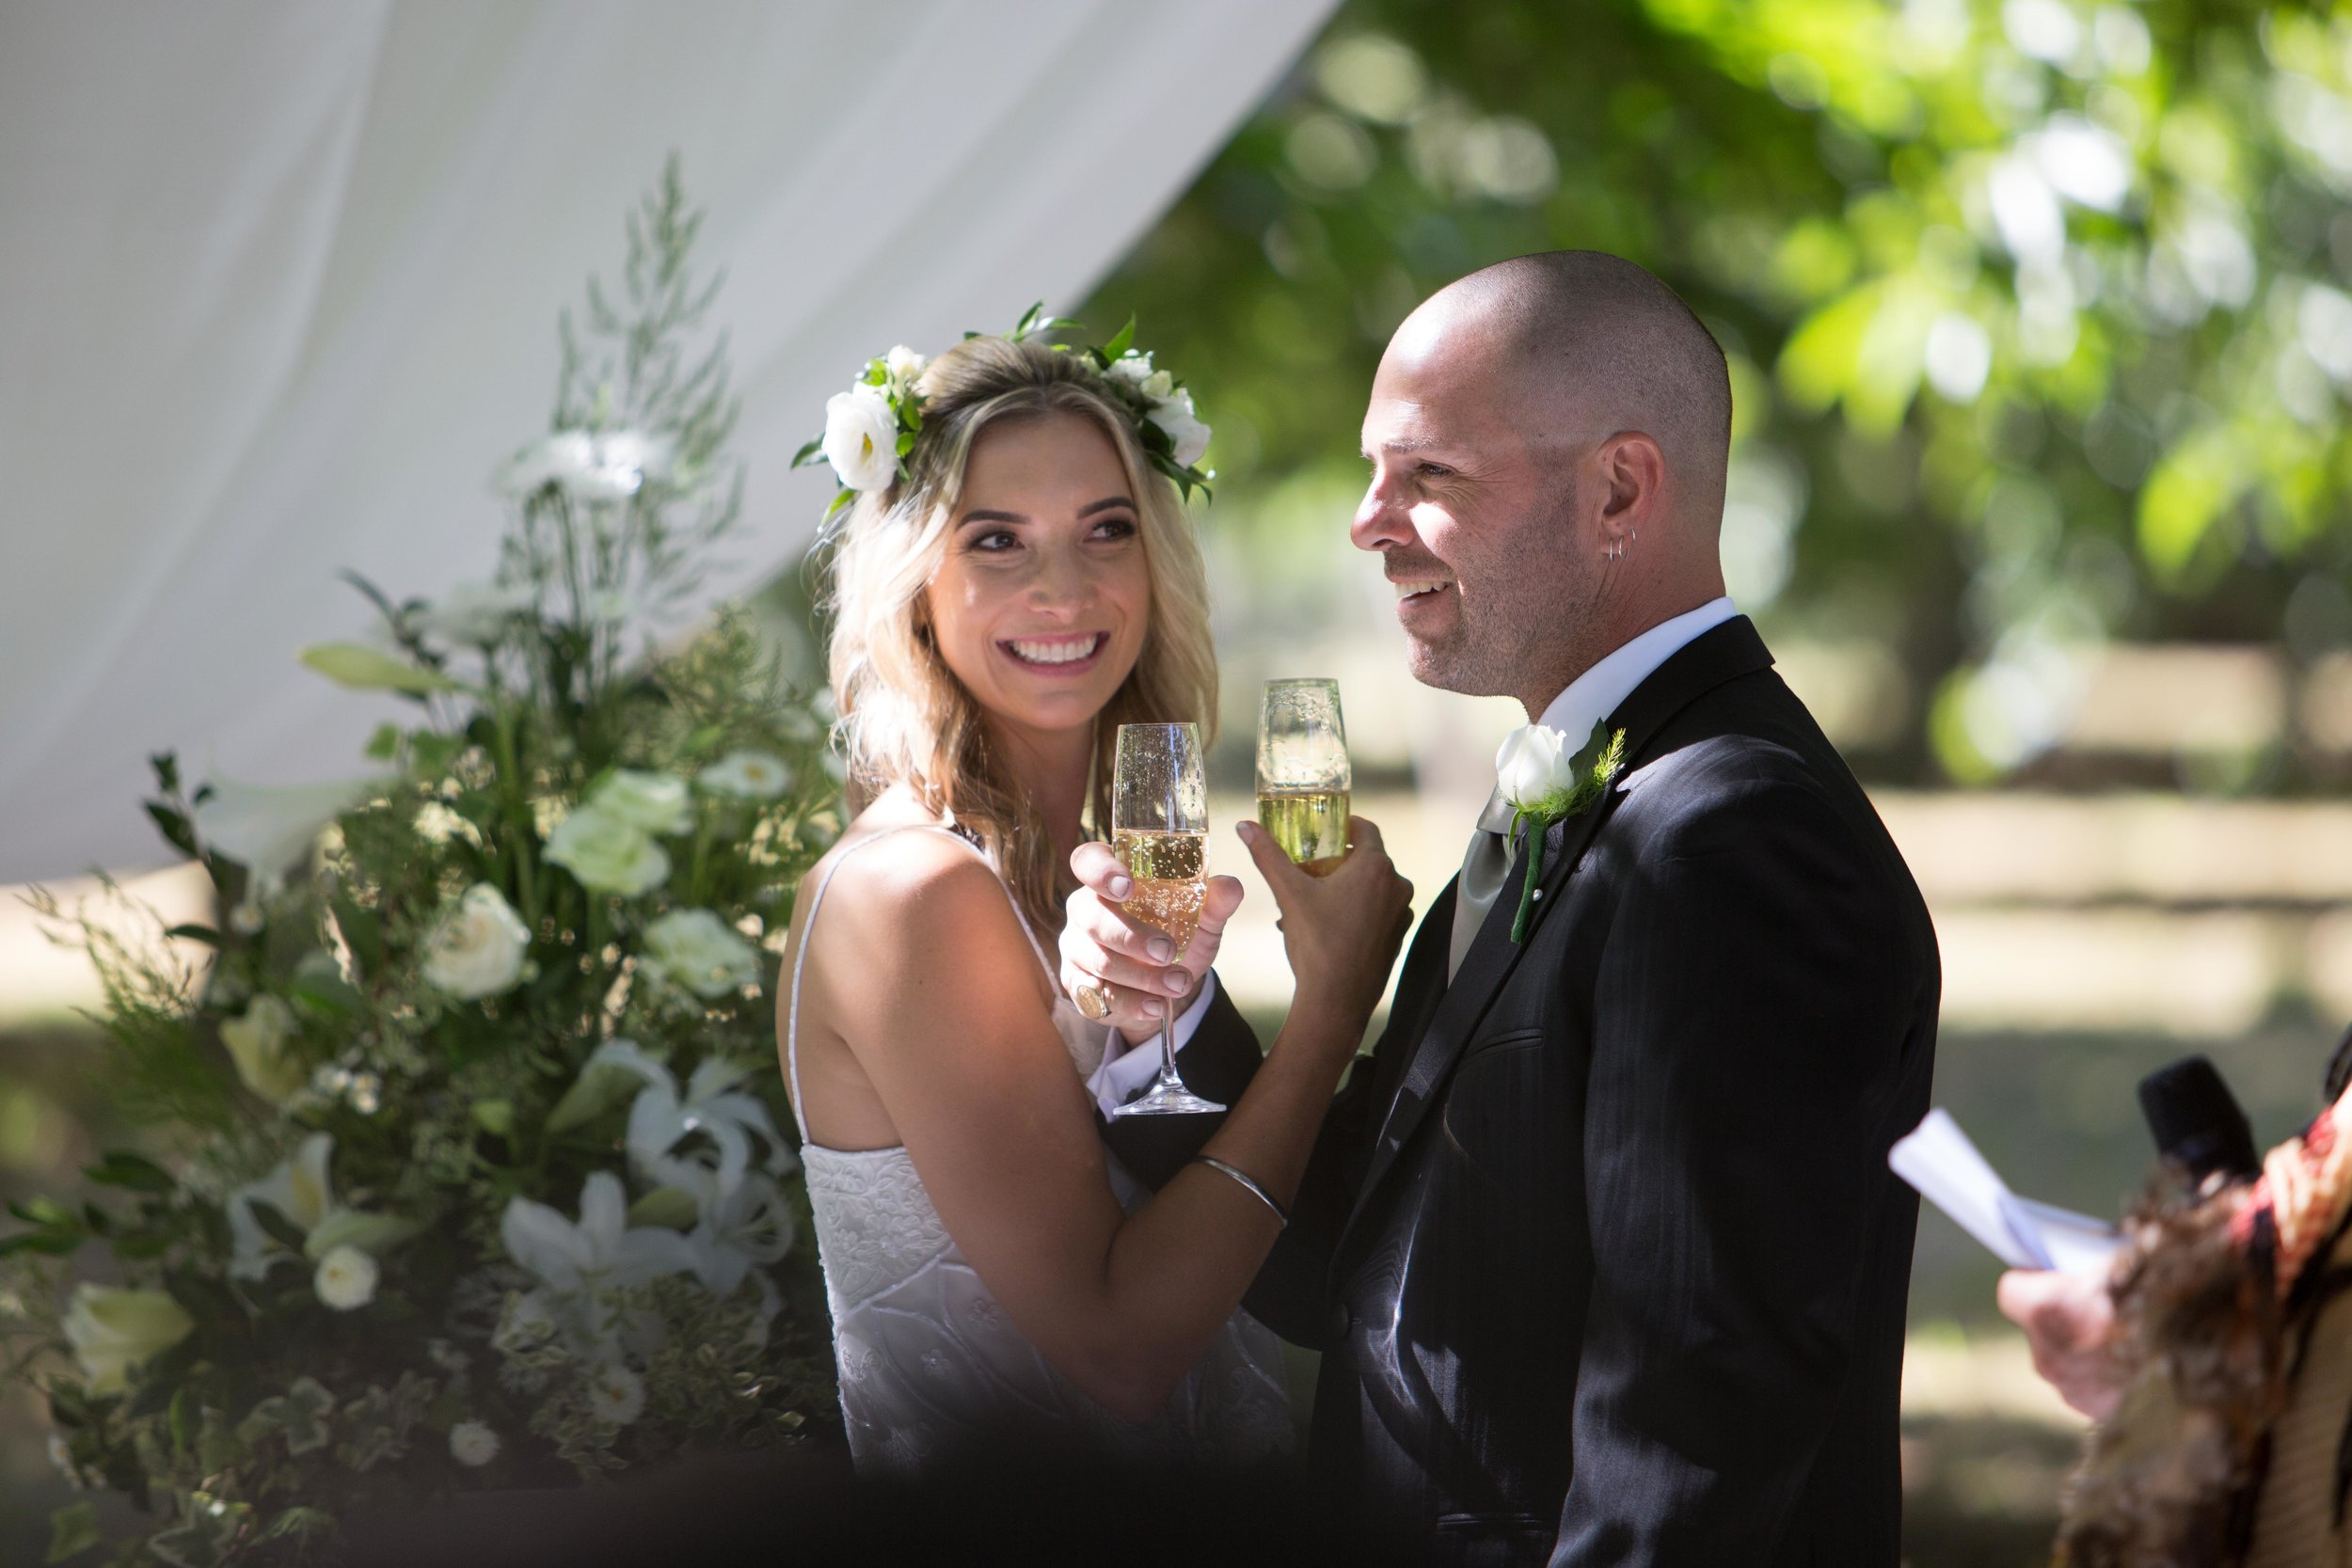 wedding-ceremony-11.jpg